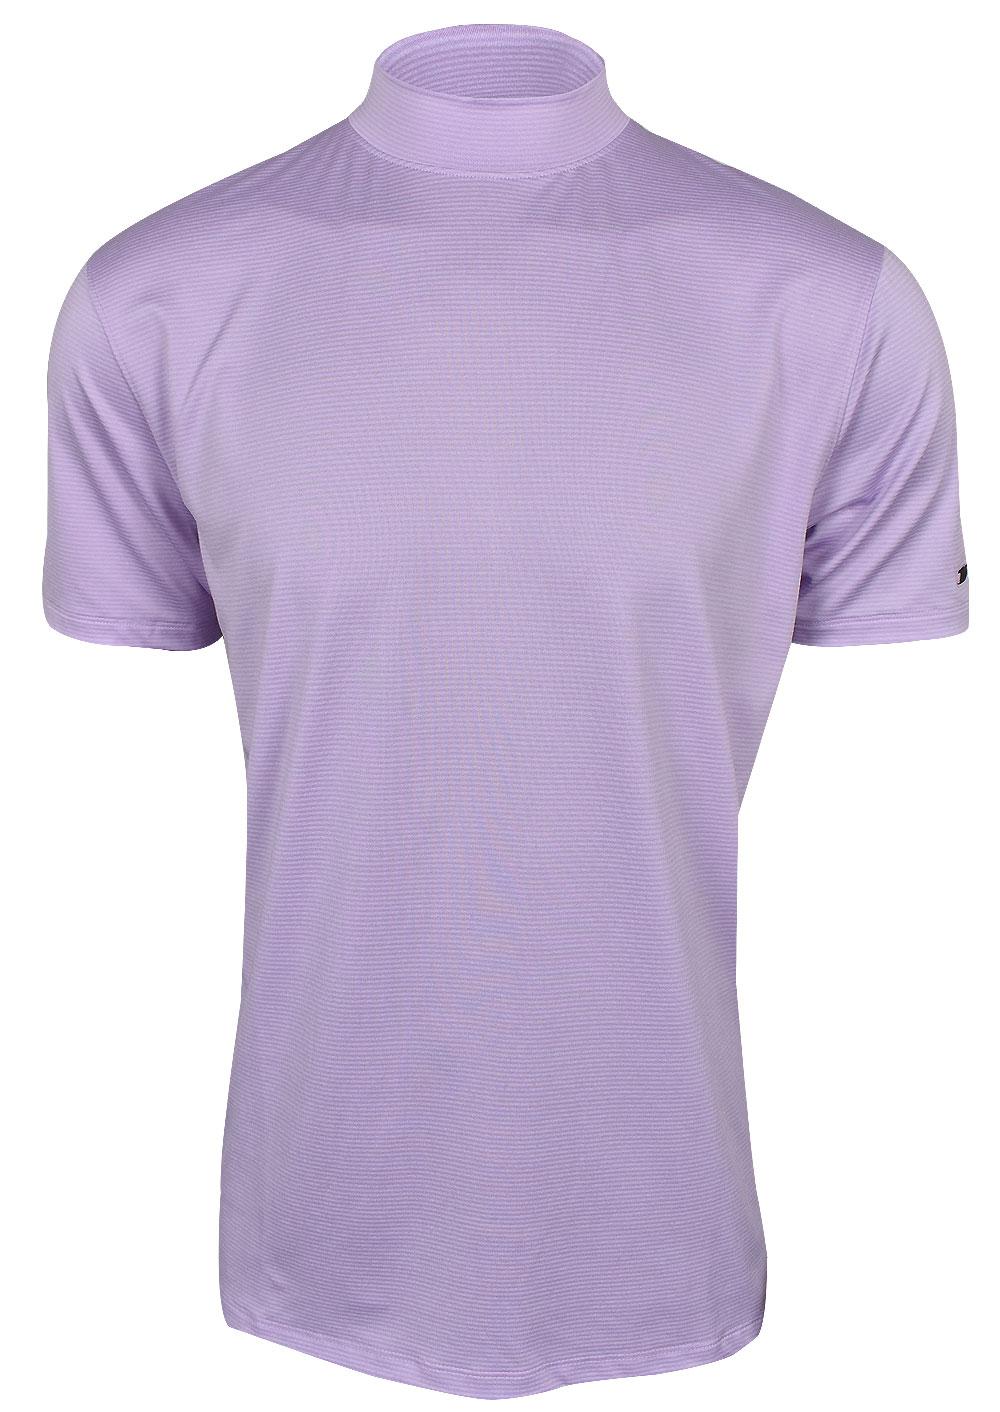 fd47f8b8dbff0 Nike Golf Dri-FIT TW Vapor Mock Neck Shirt (Sporting Goods) photo